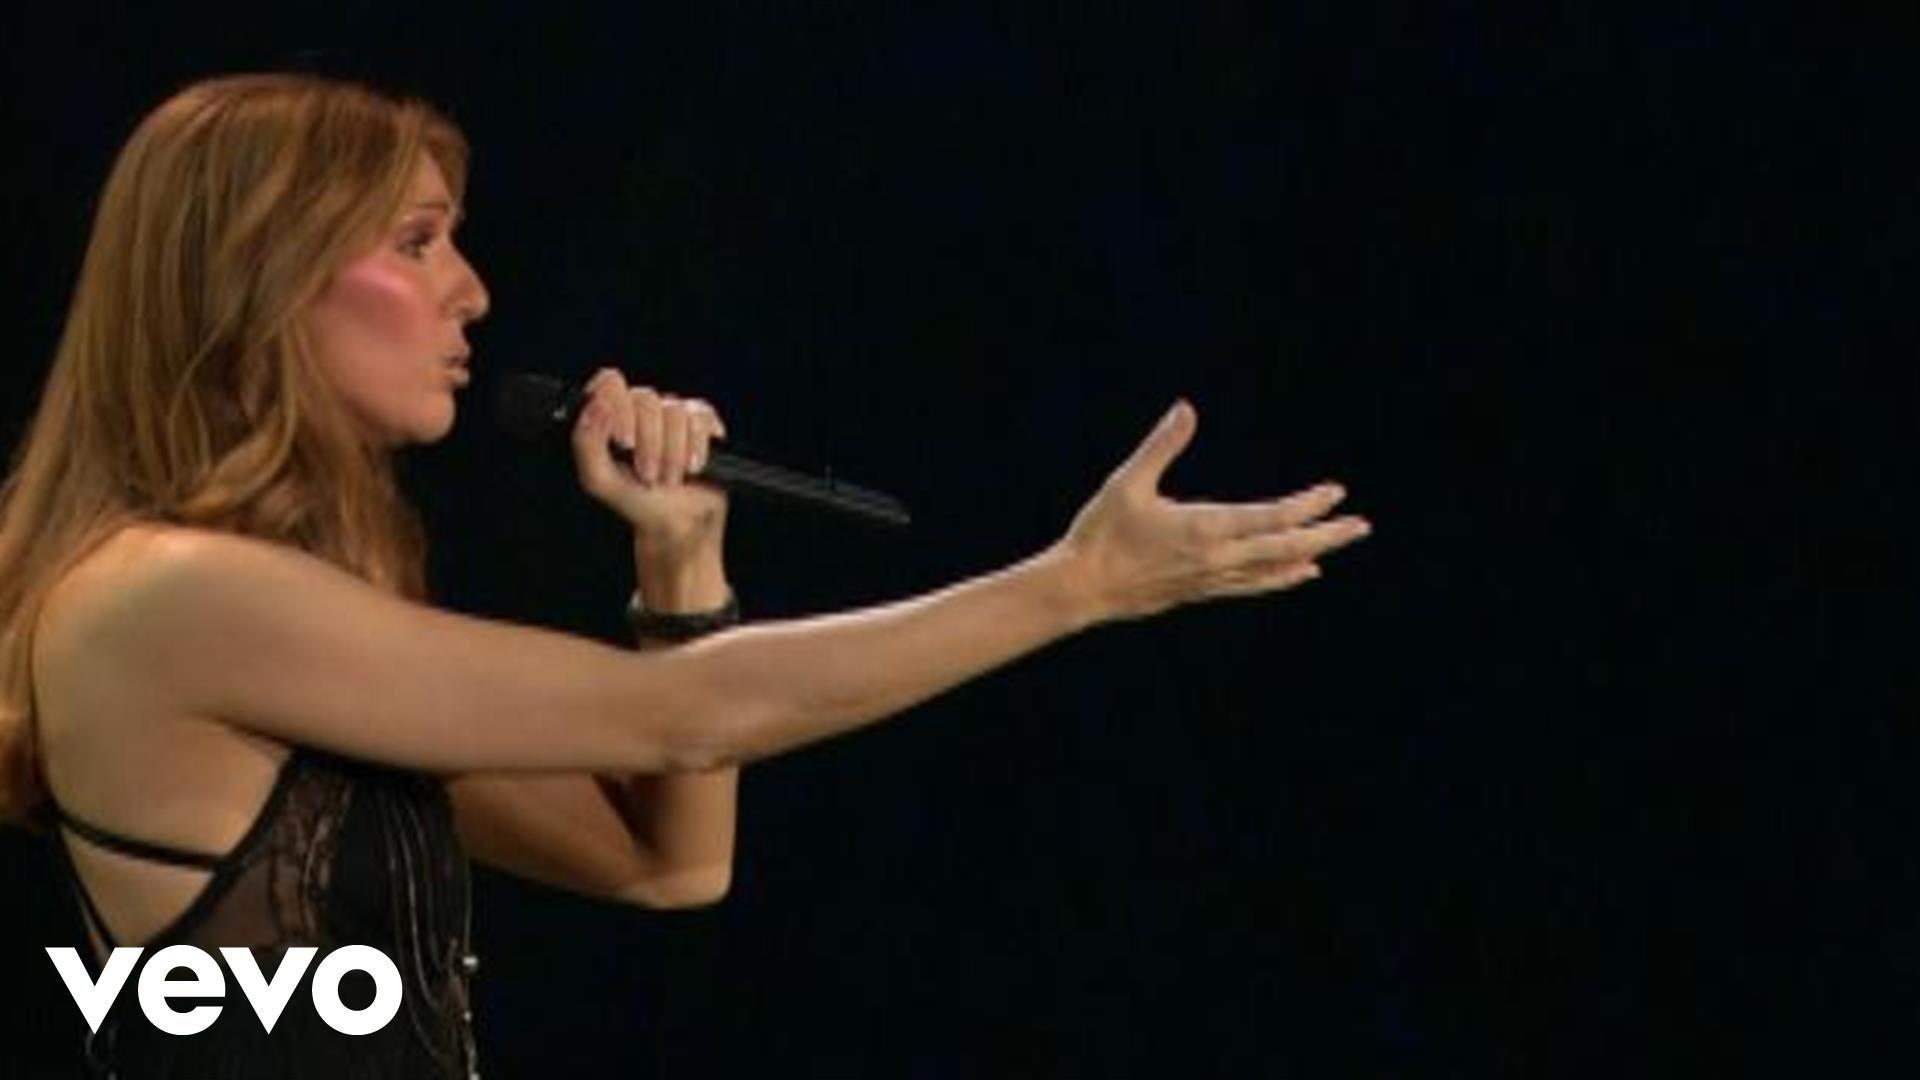 Celine Dion セリーヌ・ディオン 人気曲ランキング